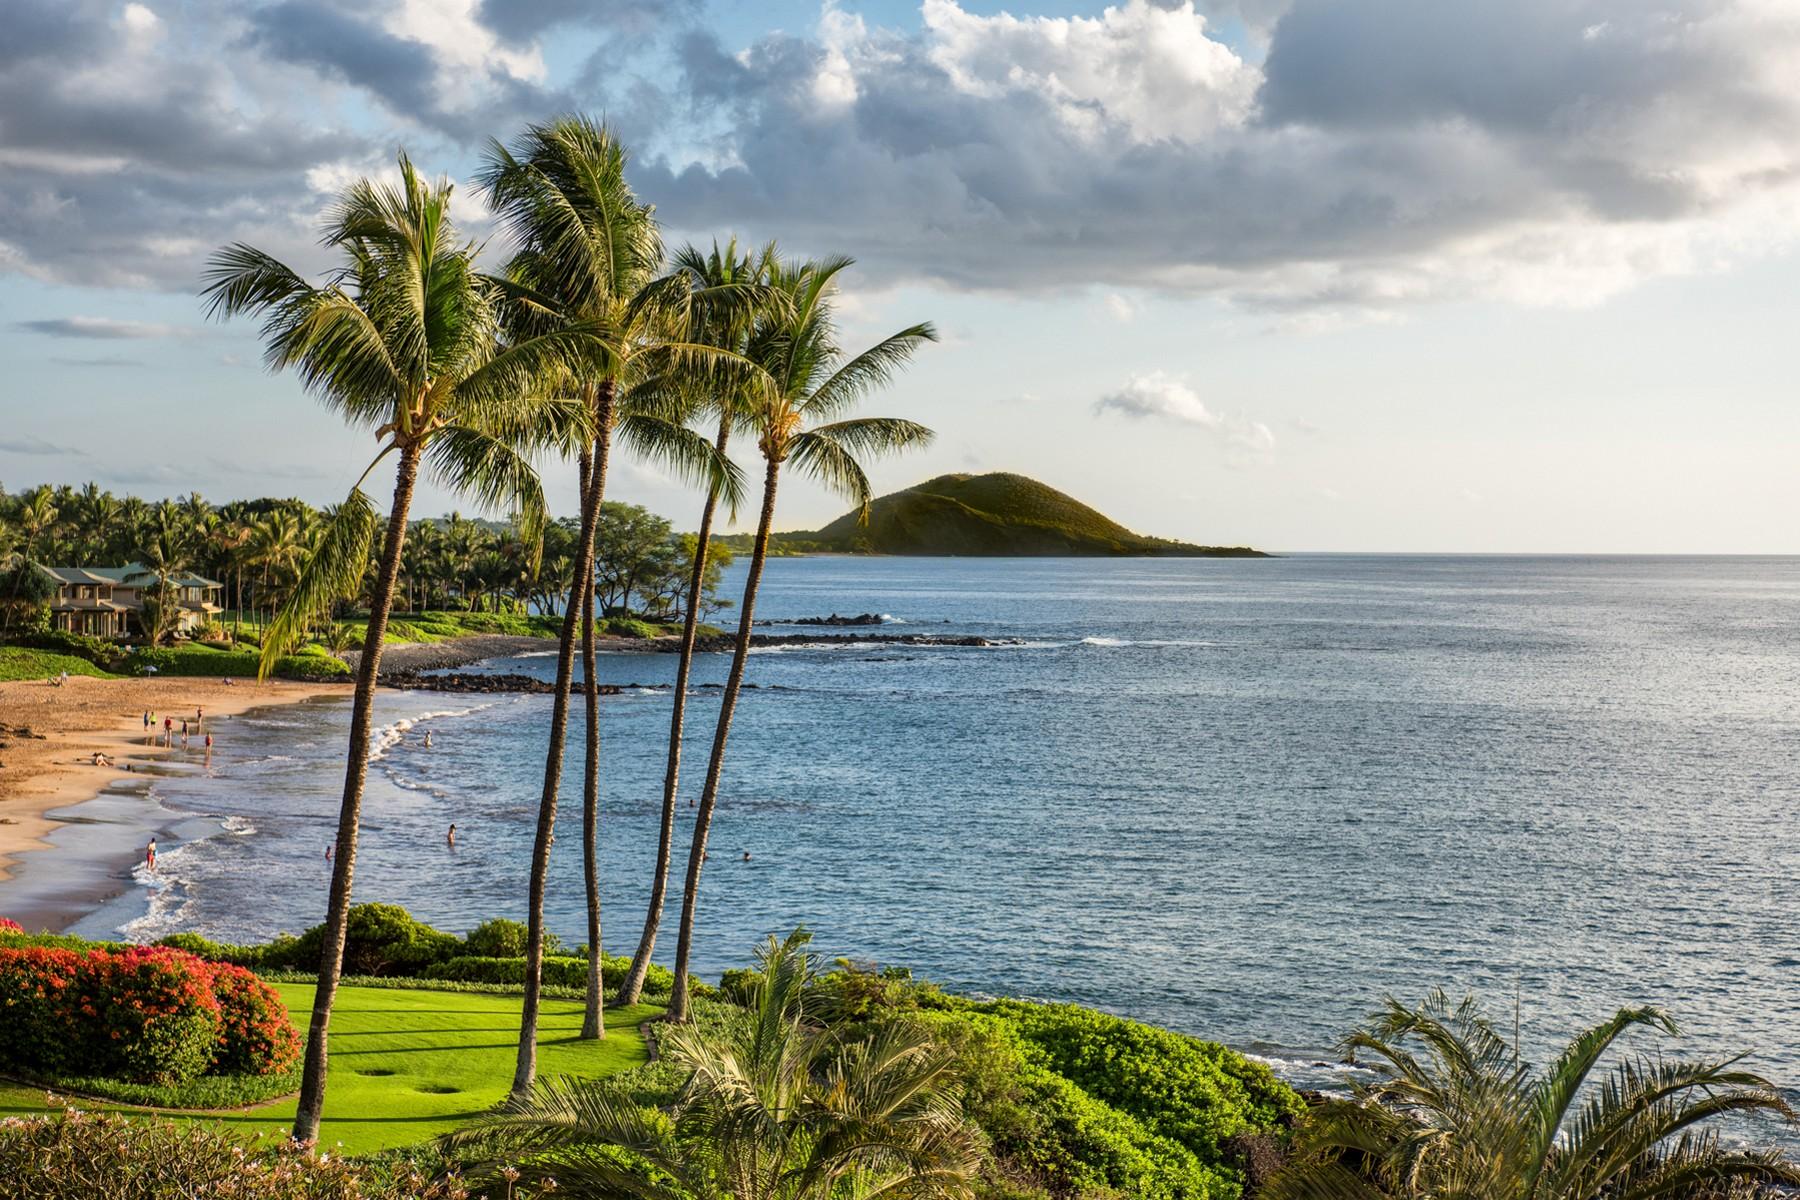 Condominium for Sale at Wailea's Finest 4000 Wailea Alanui Drive, Wailea Point 1401 Wailea, Hawaii, 96753 United States